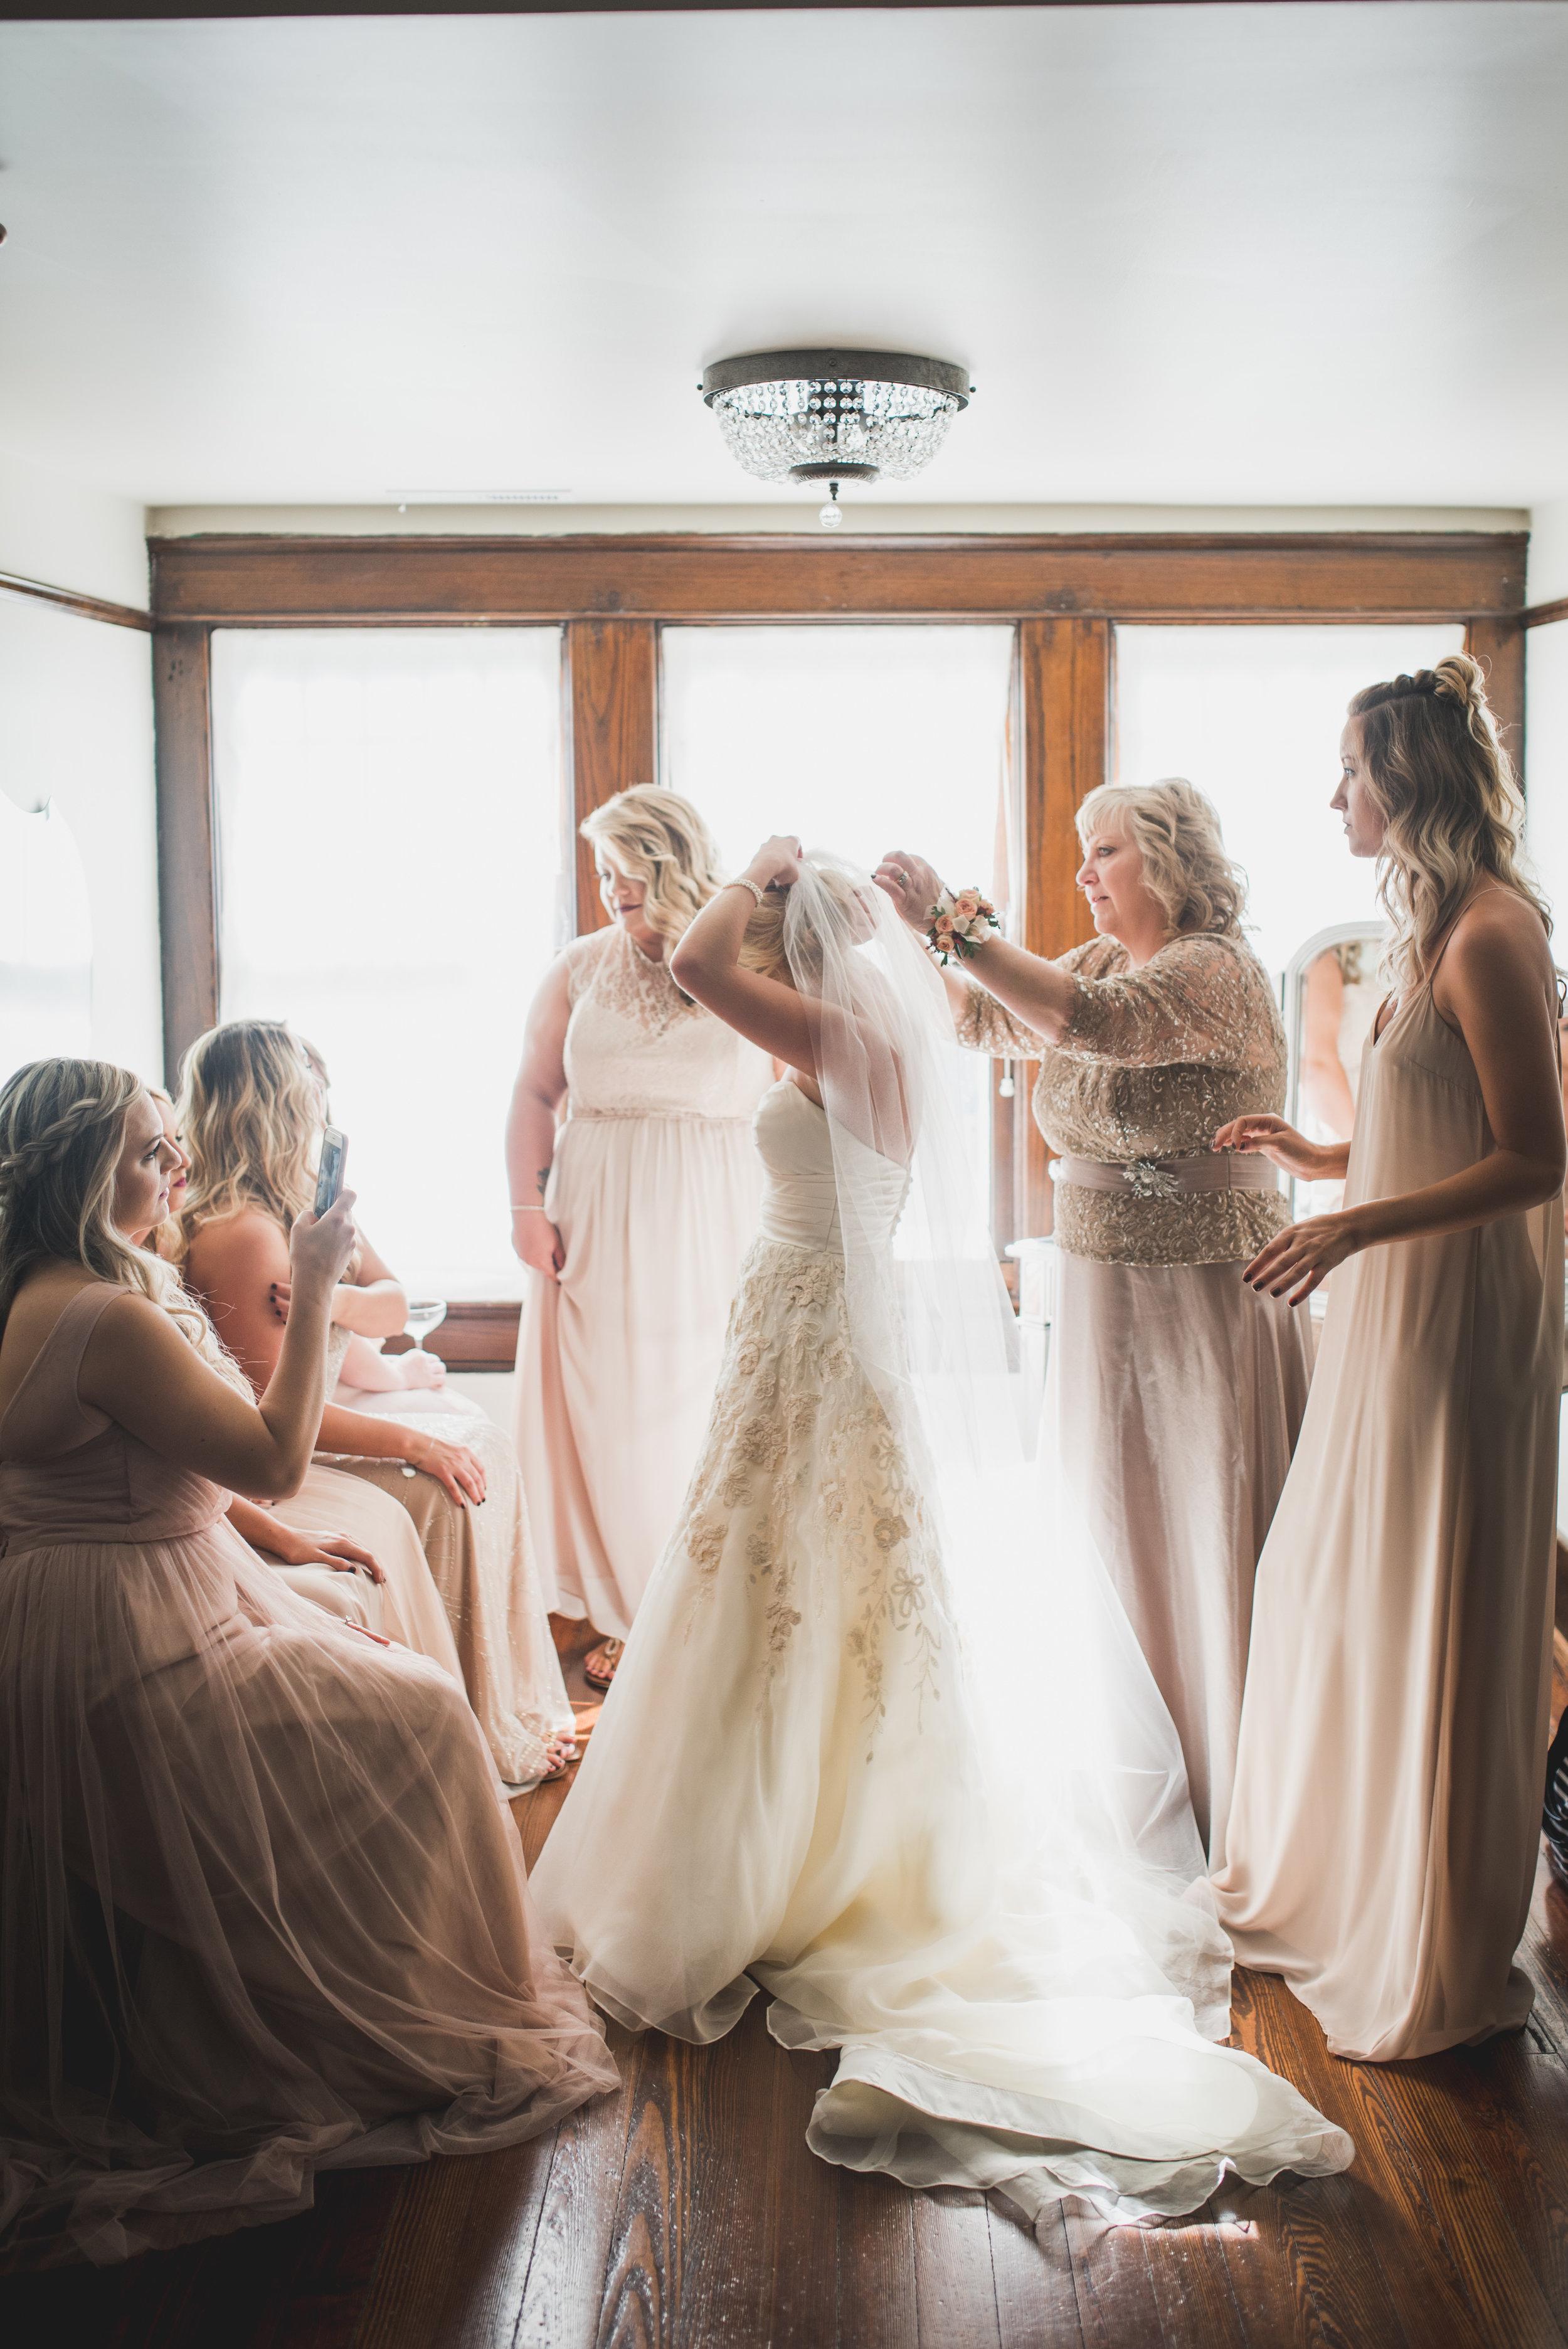 Nashville-wedding-photographers-CJ's-Off-The-Square-11.JPG